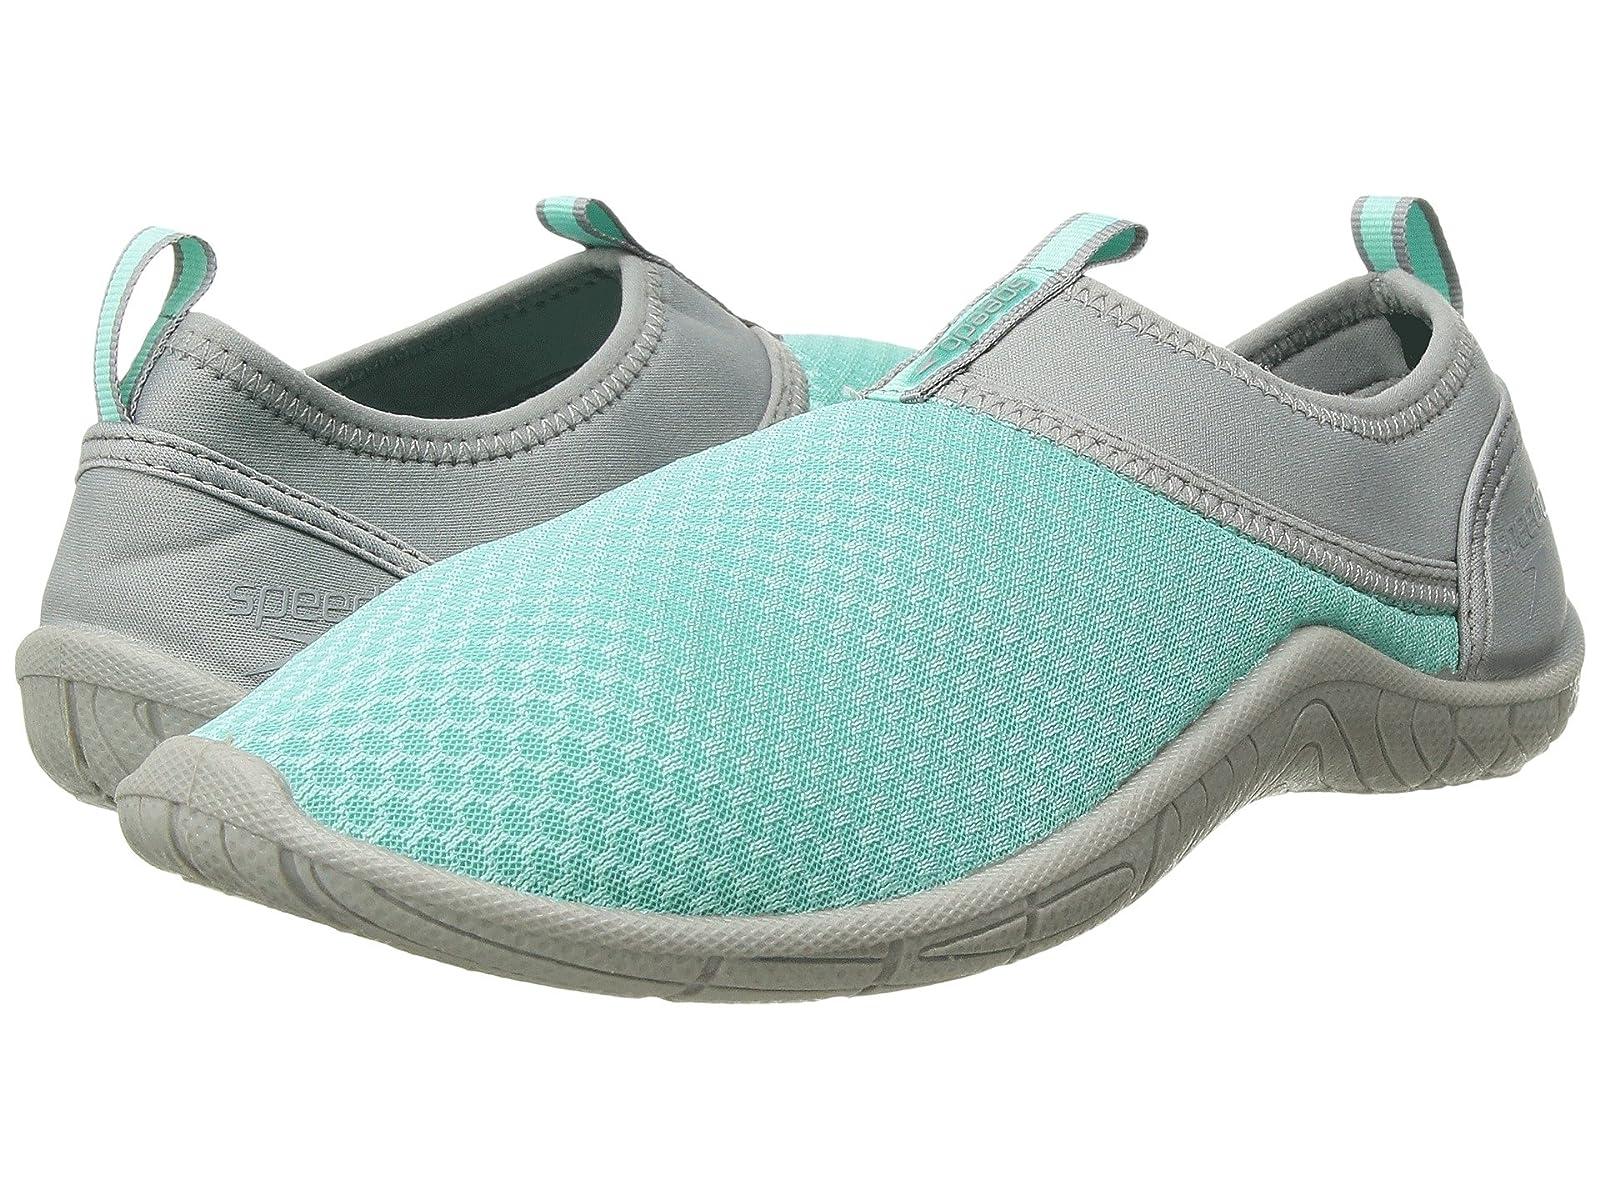 Speedo Tidal CruiserAtmospheric grades have affordable shoes